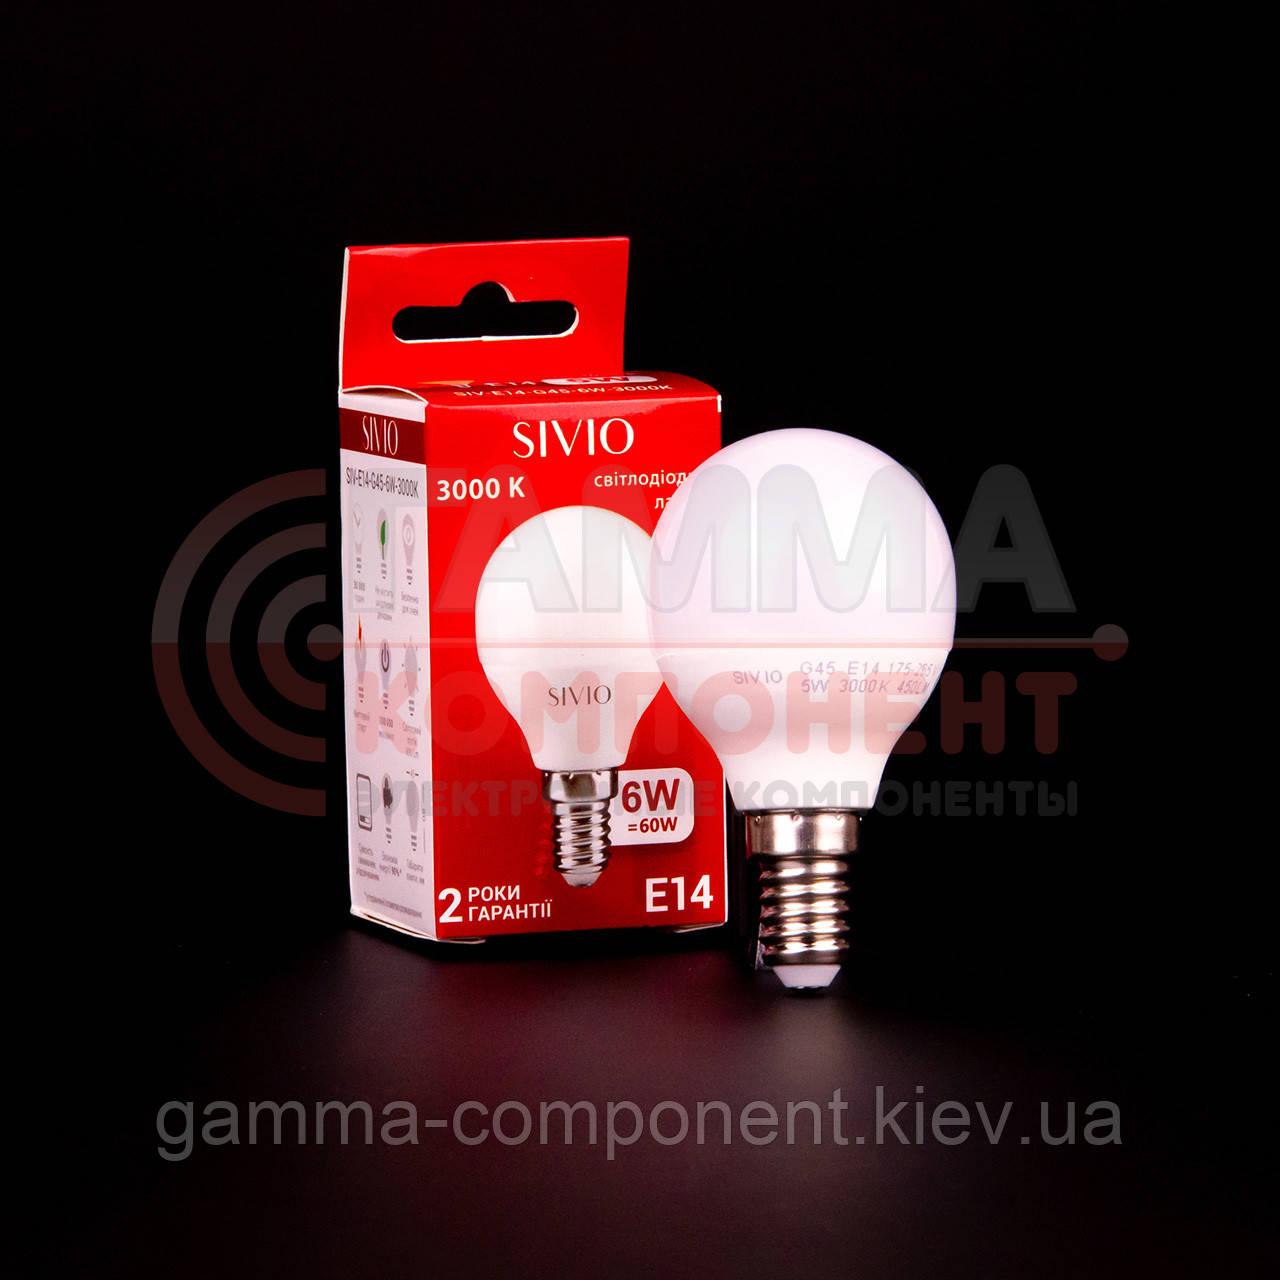 Светодиодная лампа SIVIO G45 6W, E14, 3000K, теплый белый